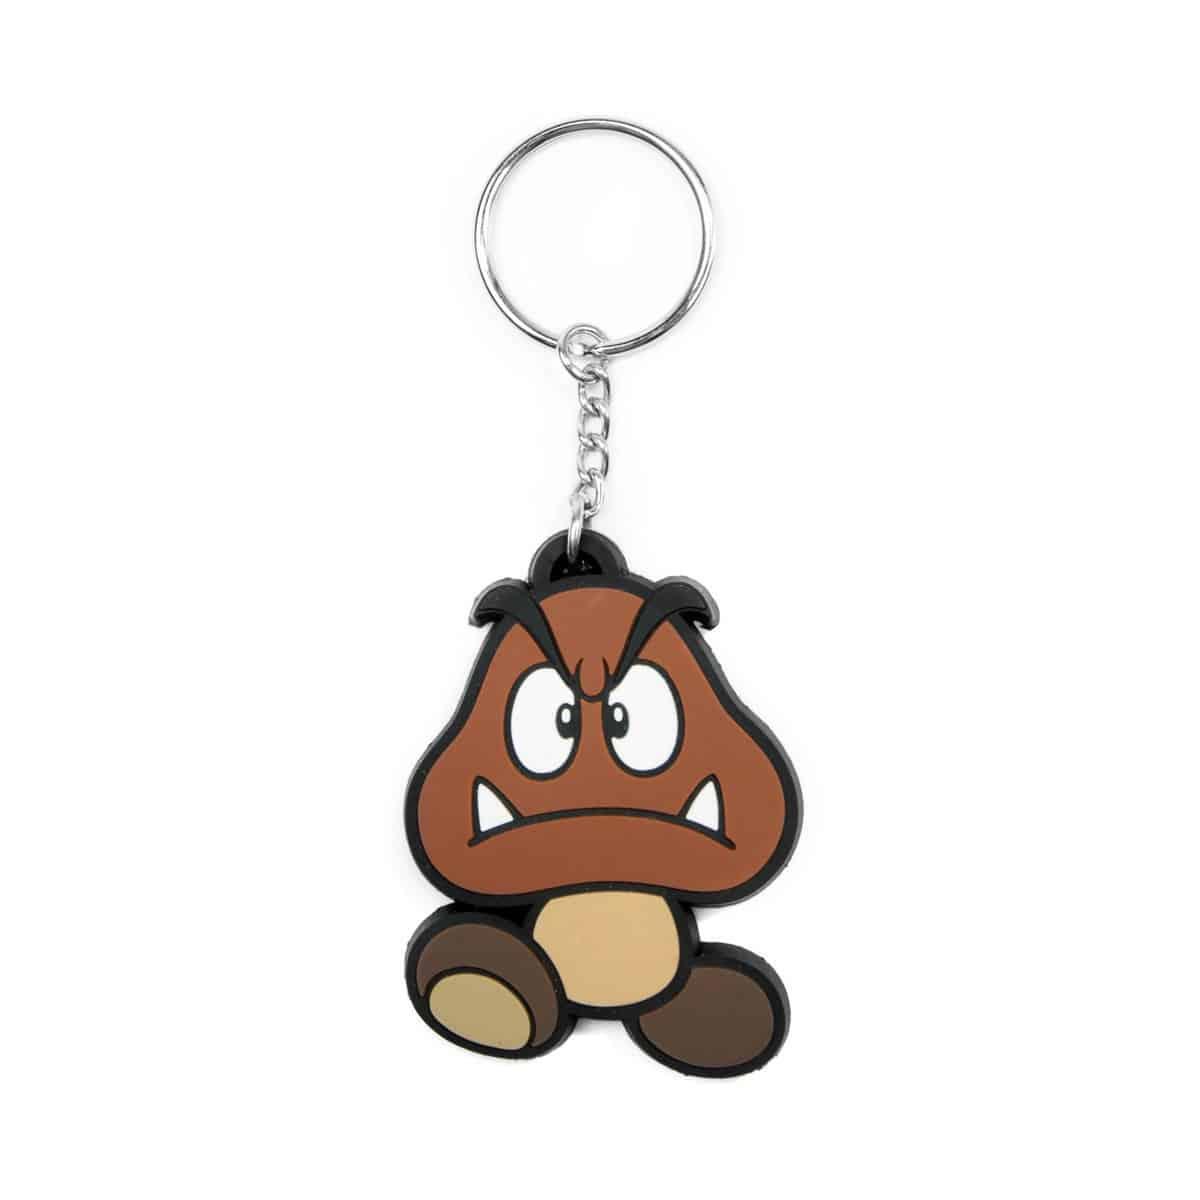 Nintendo - Goomba Rubber Keychain